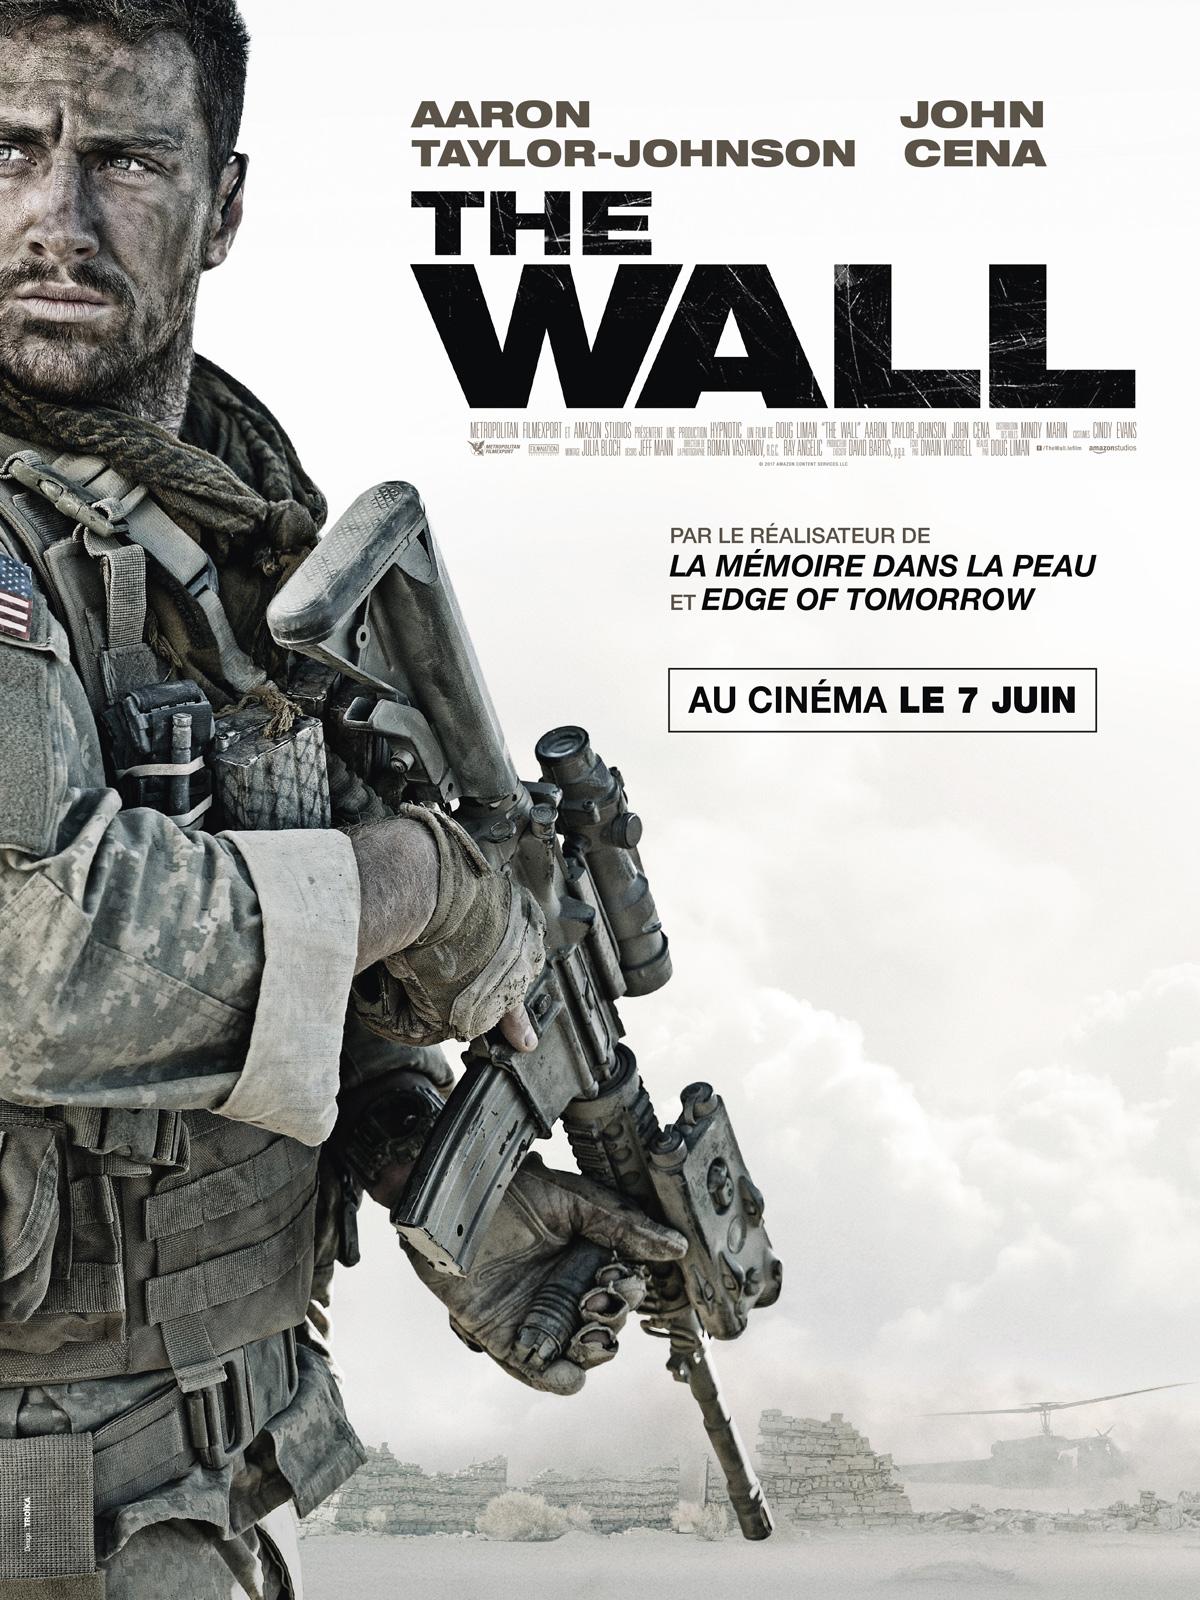 The Wall DVD & BLU-RAY